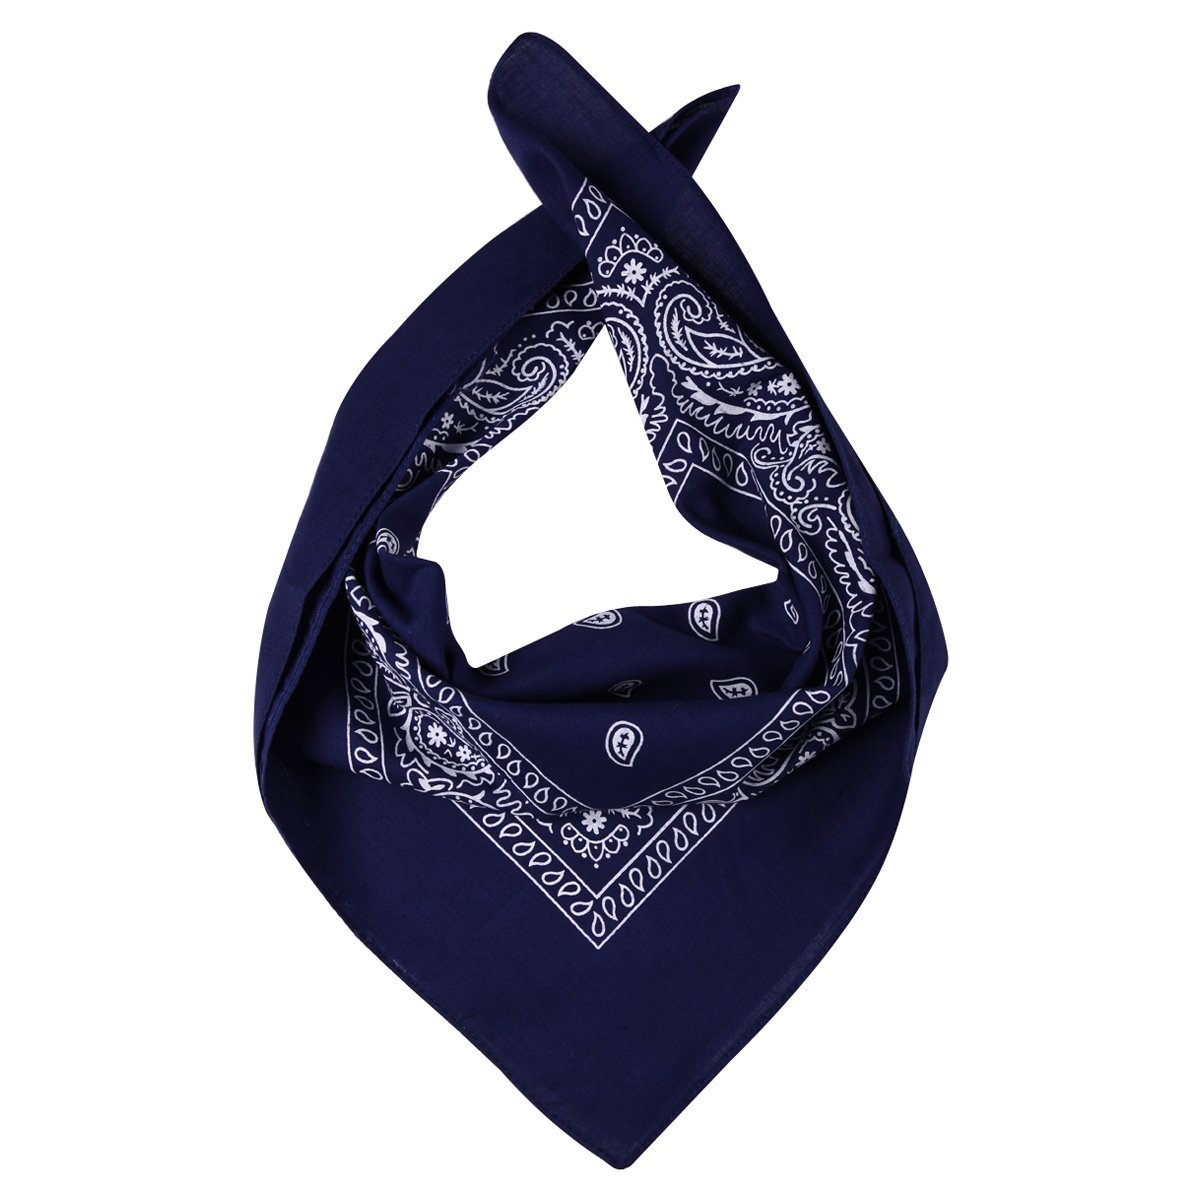 MDSP Paisley 100% Cotoon Bandana, azul marino NanJing Hao Feng Garment Co. Ltd.